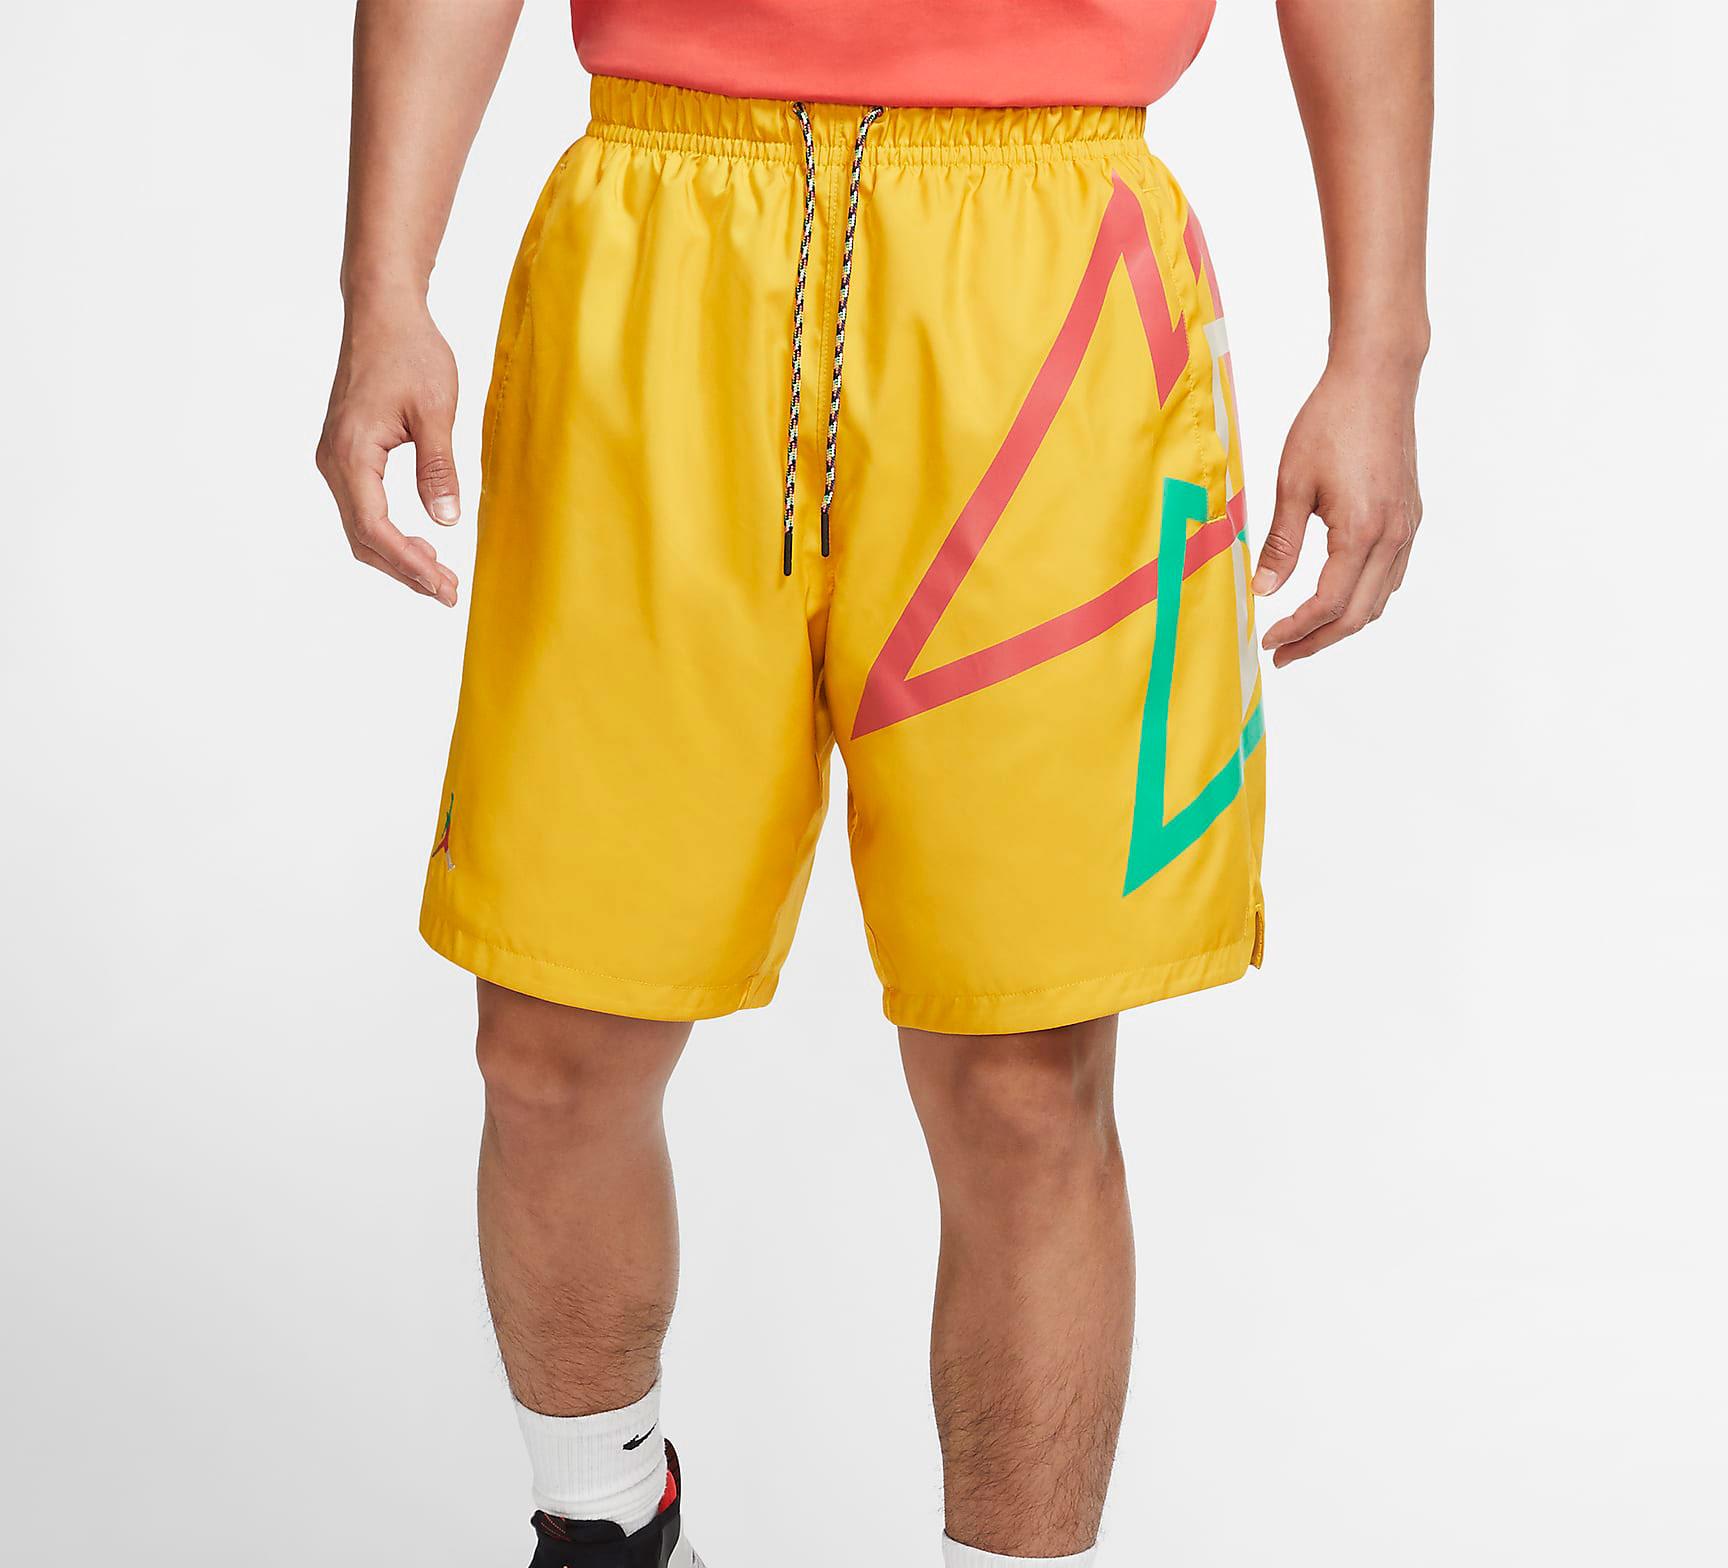 air-jordan-12-university-gold-matching-shorts-1